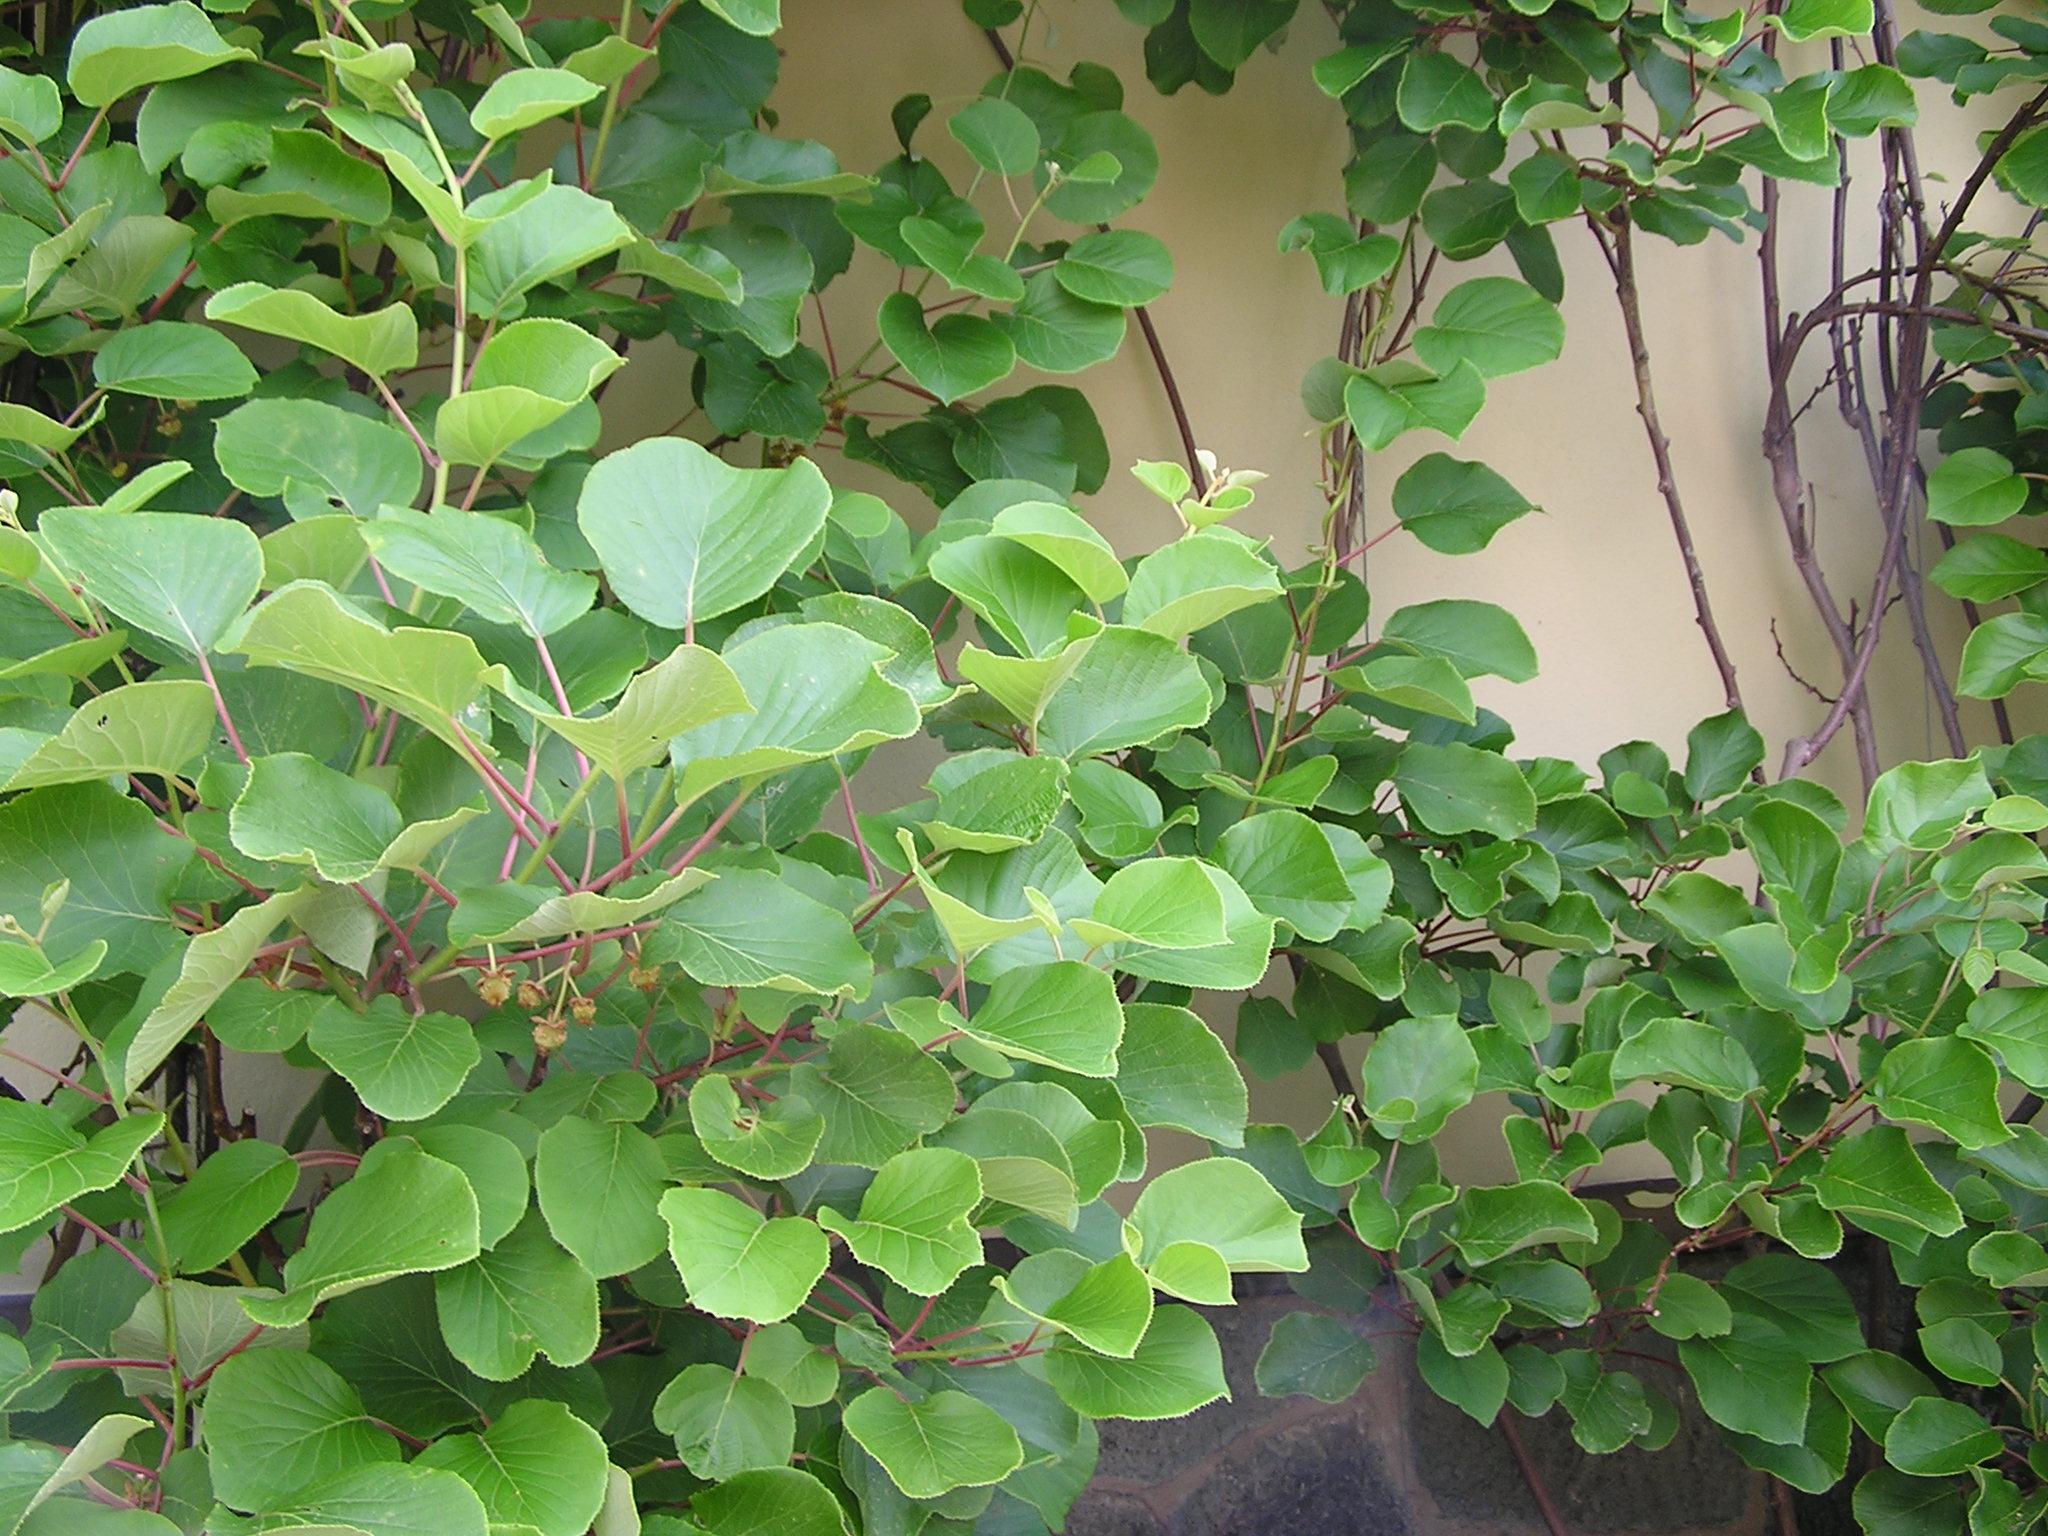 actinidia actinidia chinensis actinidia deliciosa actinidia sinensis groseille de chine. Black Bedroom Furniture Sets. Home Design Ideas